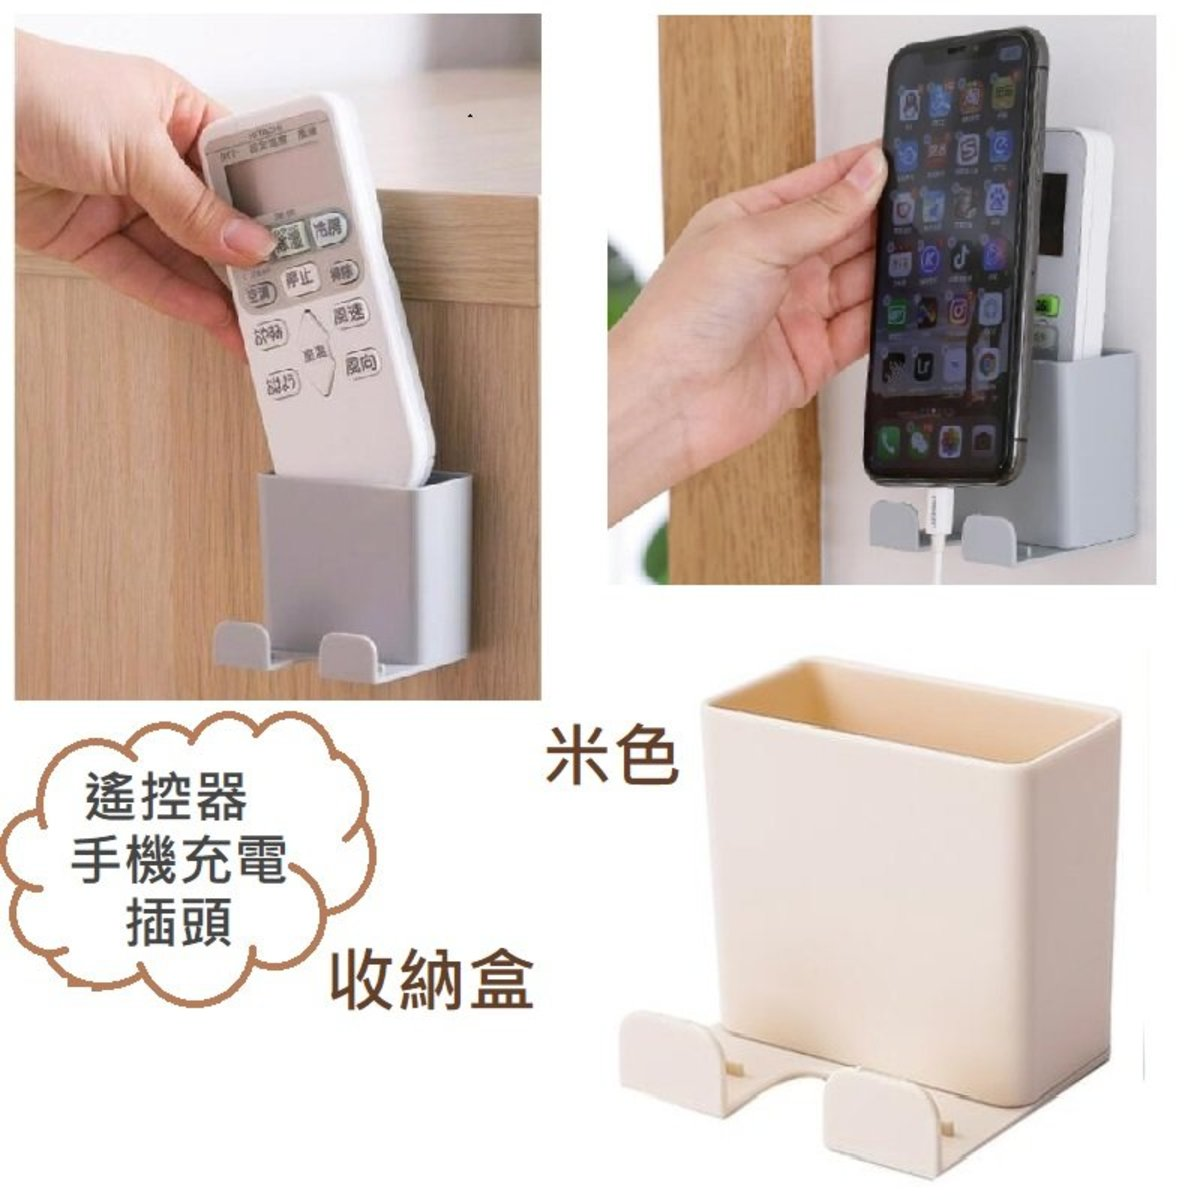 EL0218-Remote, Mobile Phone Storage Box